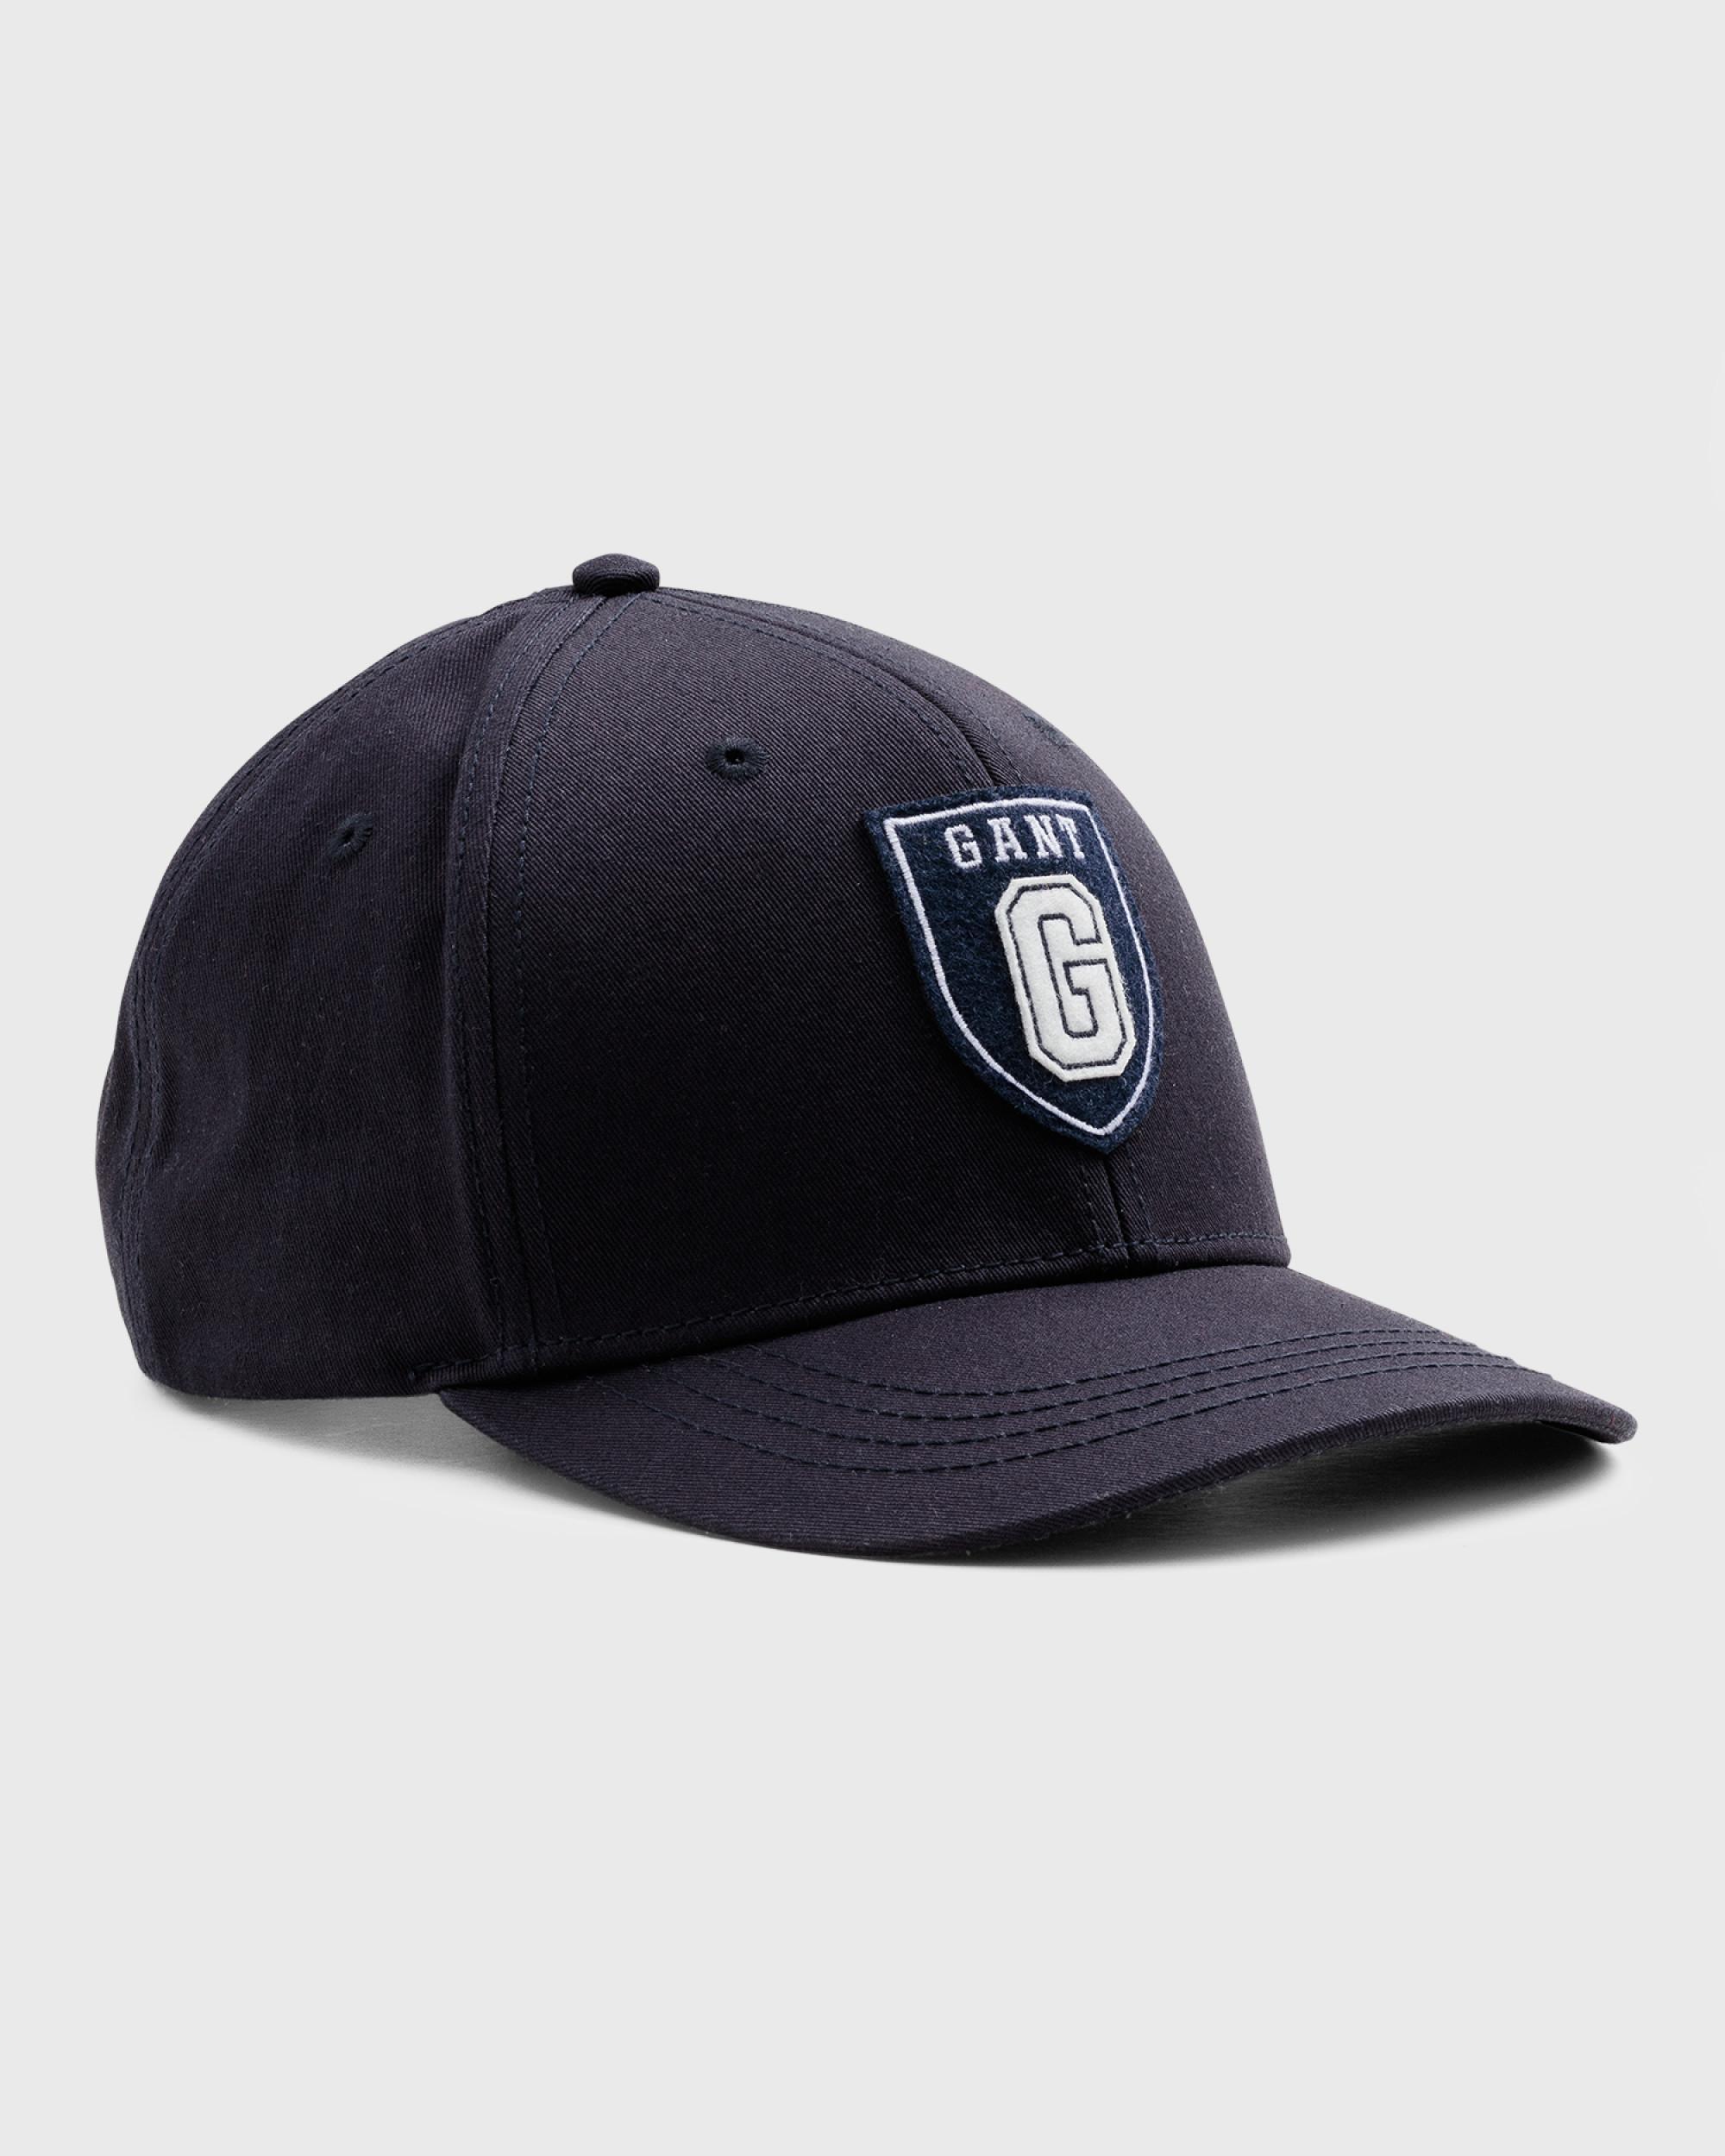 d7bc9db56b0 Gant - Blue Collegiate Twill Cap for Men - Lyst. View fullscreen